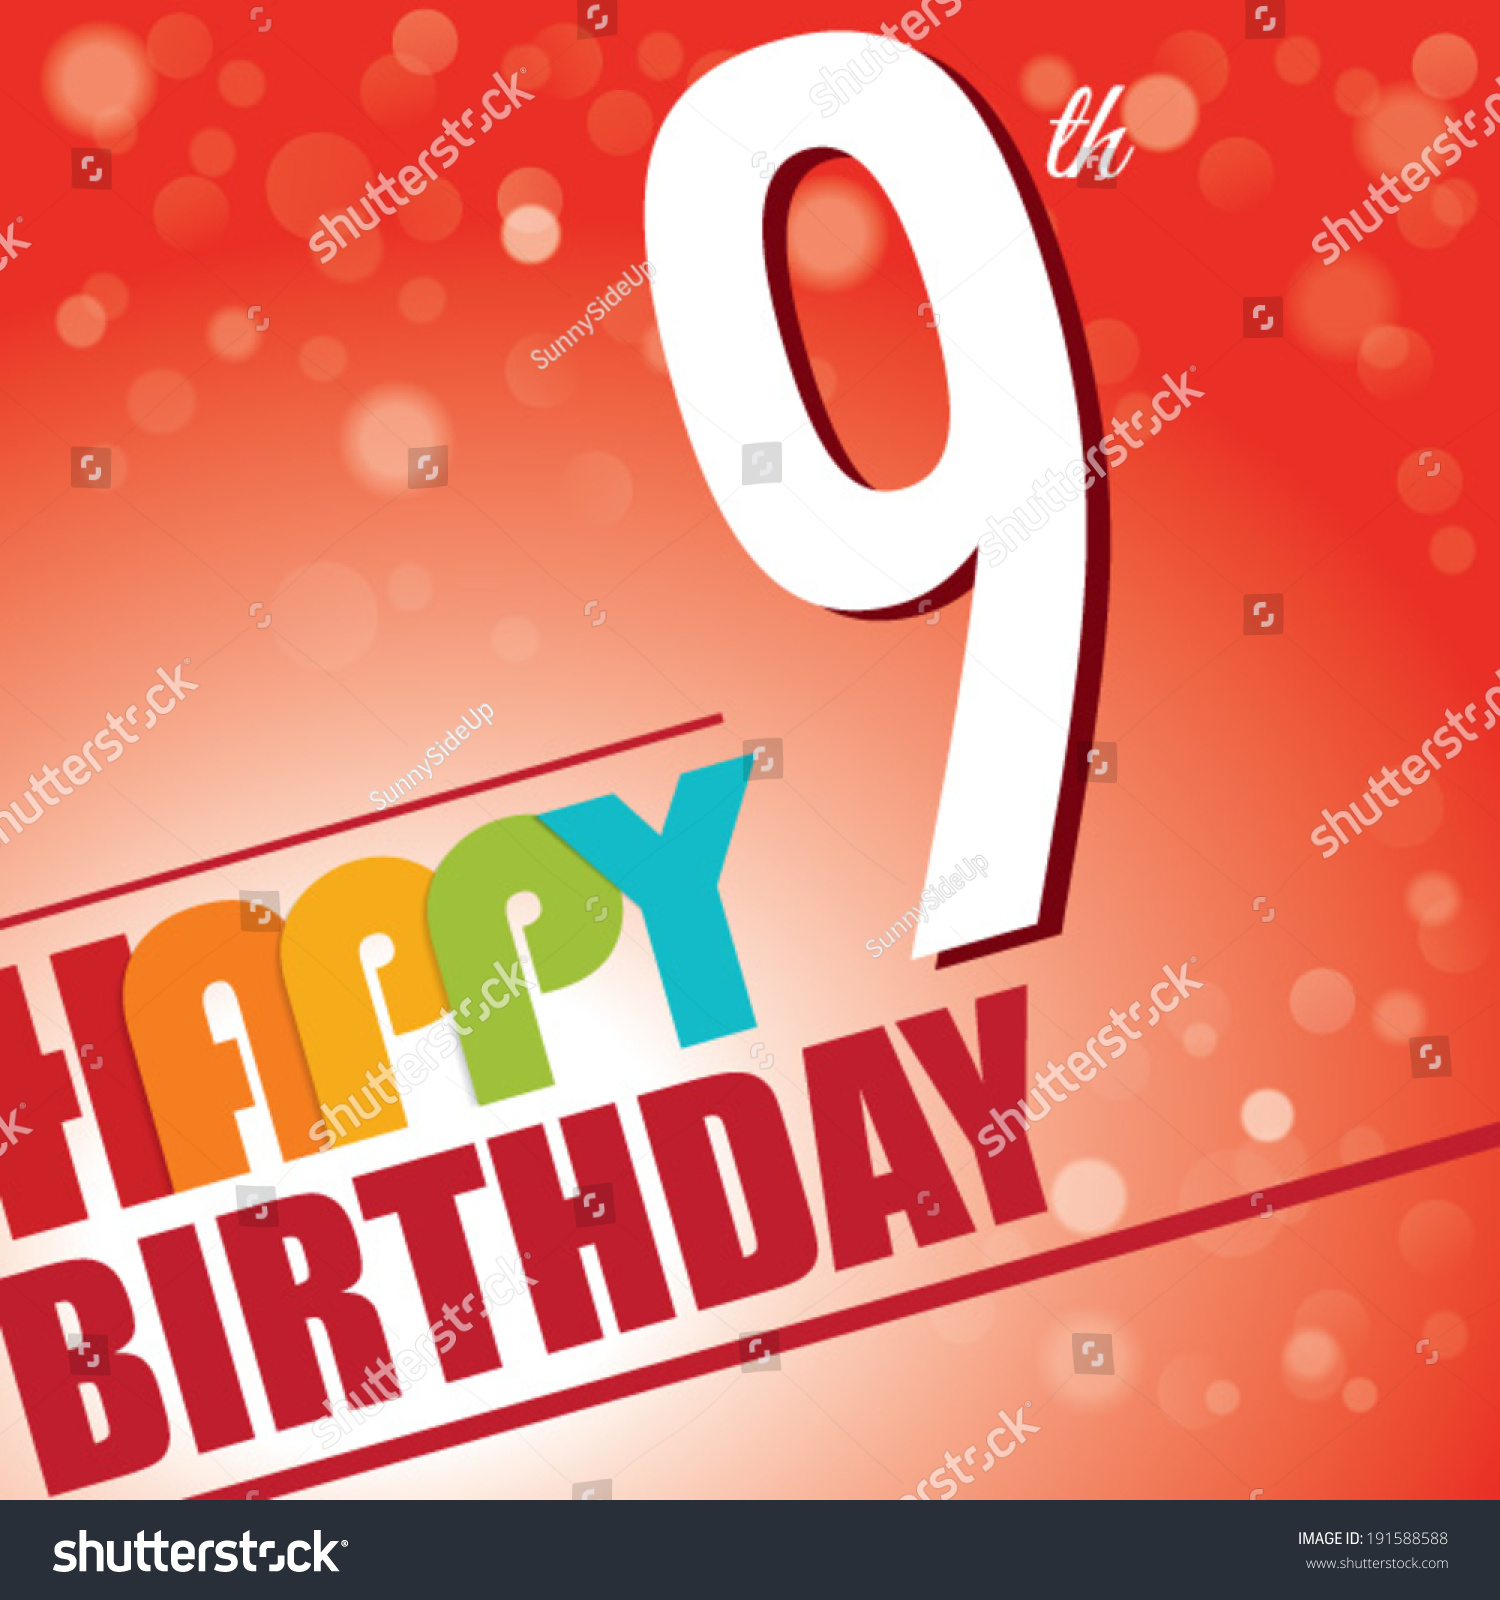 9th Birthday Party Invitetemplate Design Bright Stock Vector ...